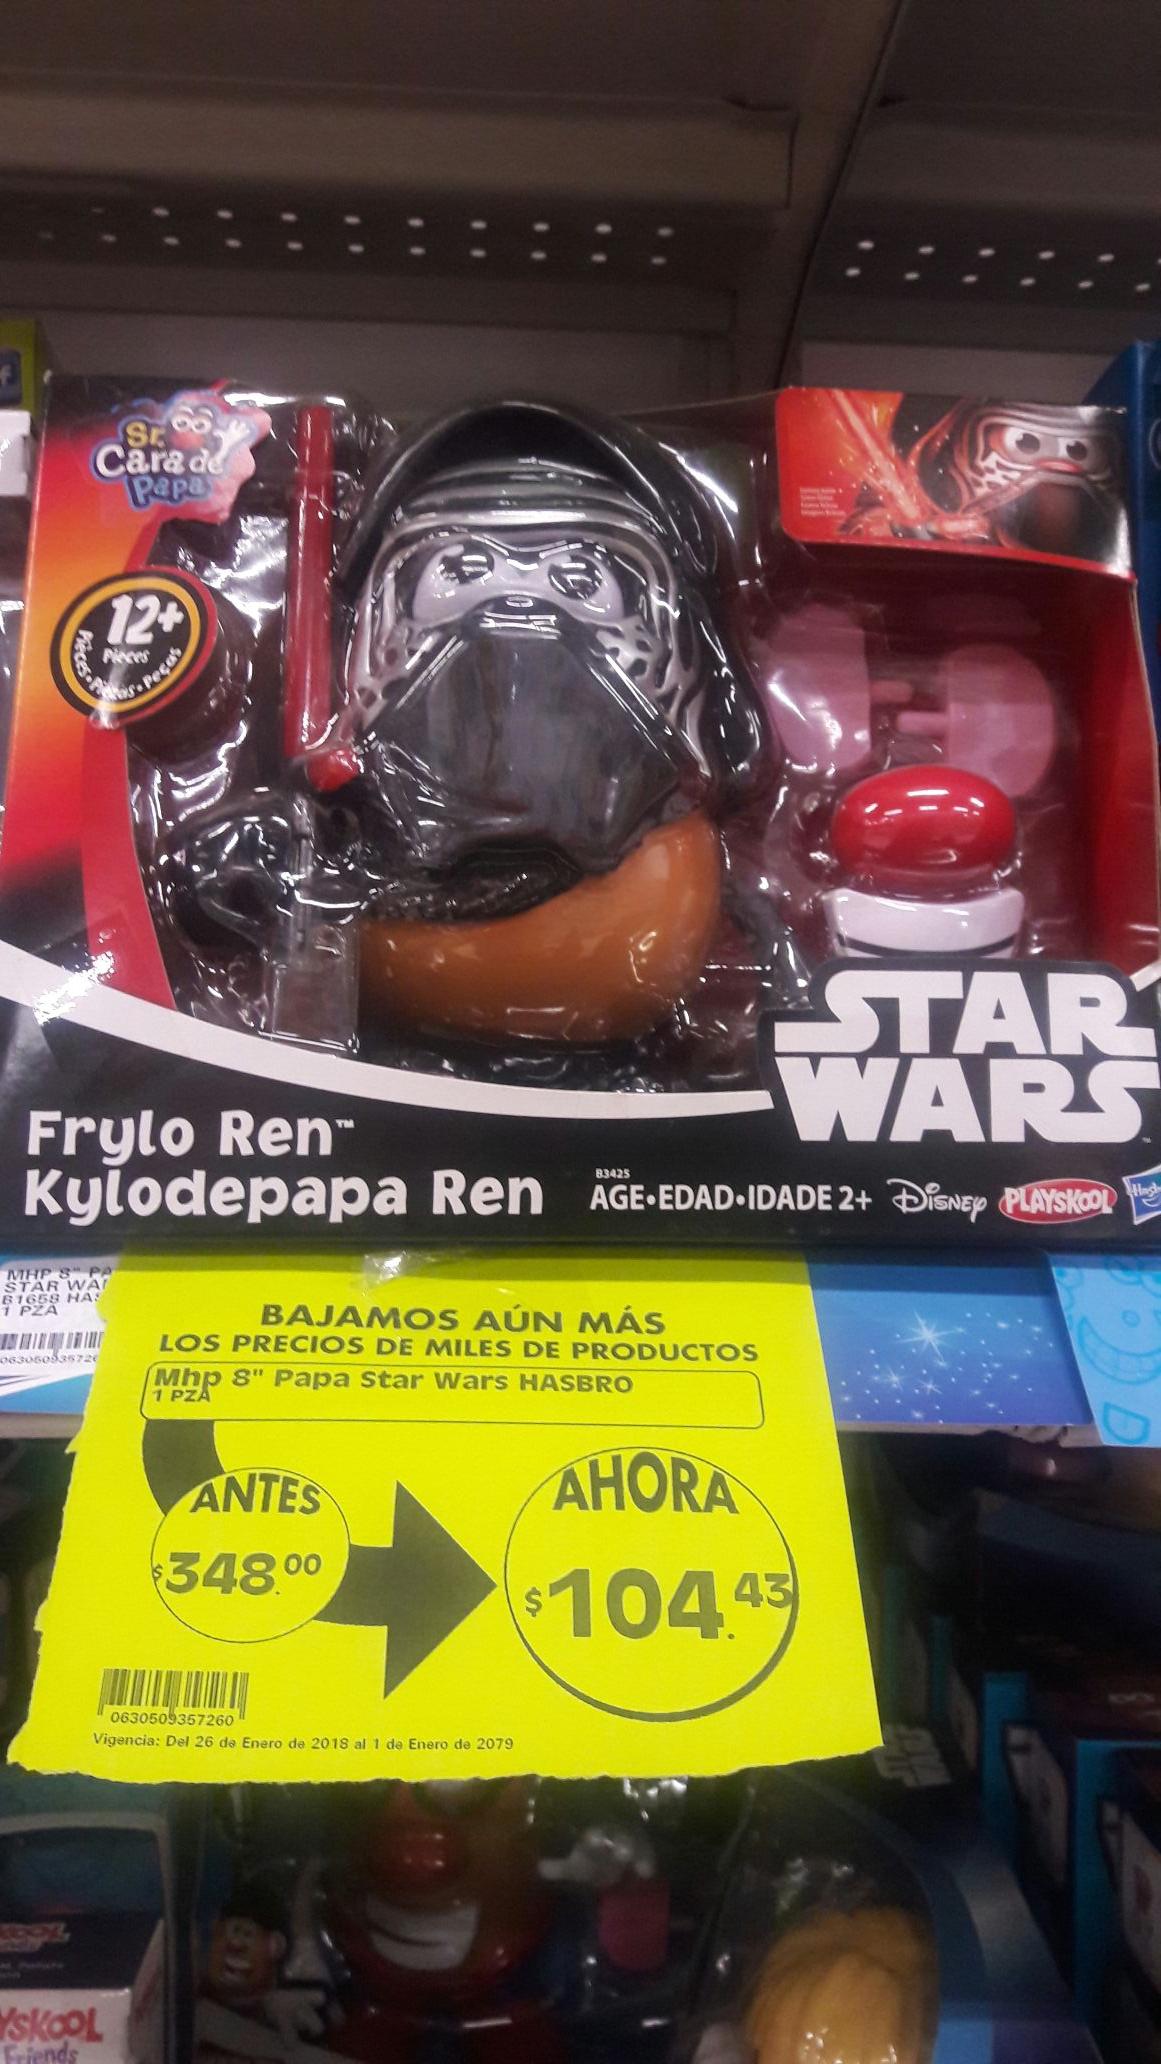 Comercial Mexicana: Señor cara de papa Star Wars